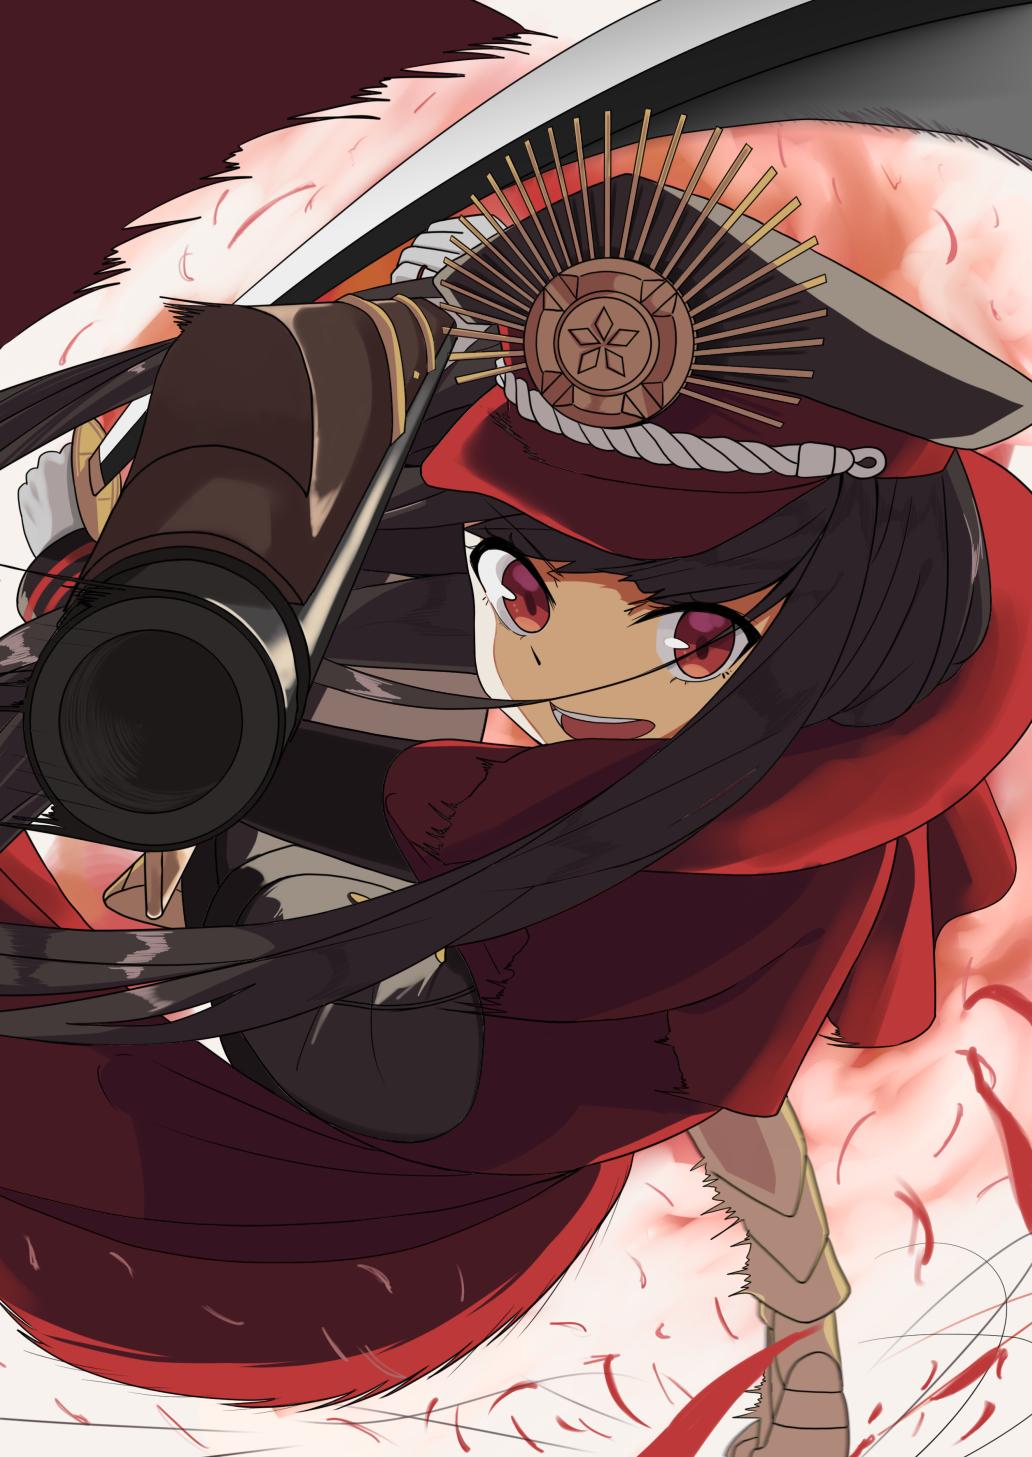 Wallpaper : Fate Grand Order, archer, Oda Nobunaga 1032x1457